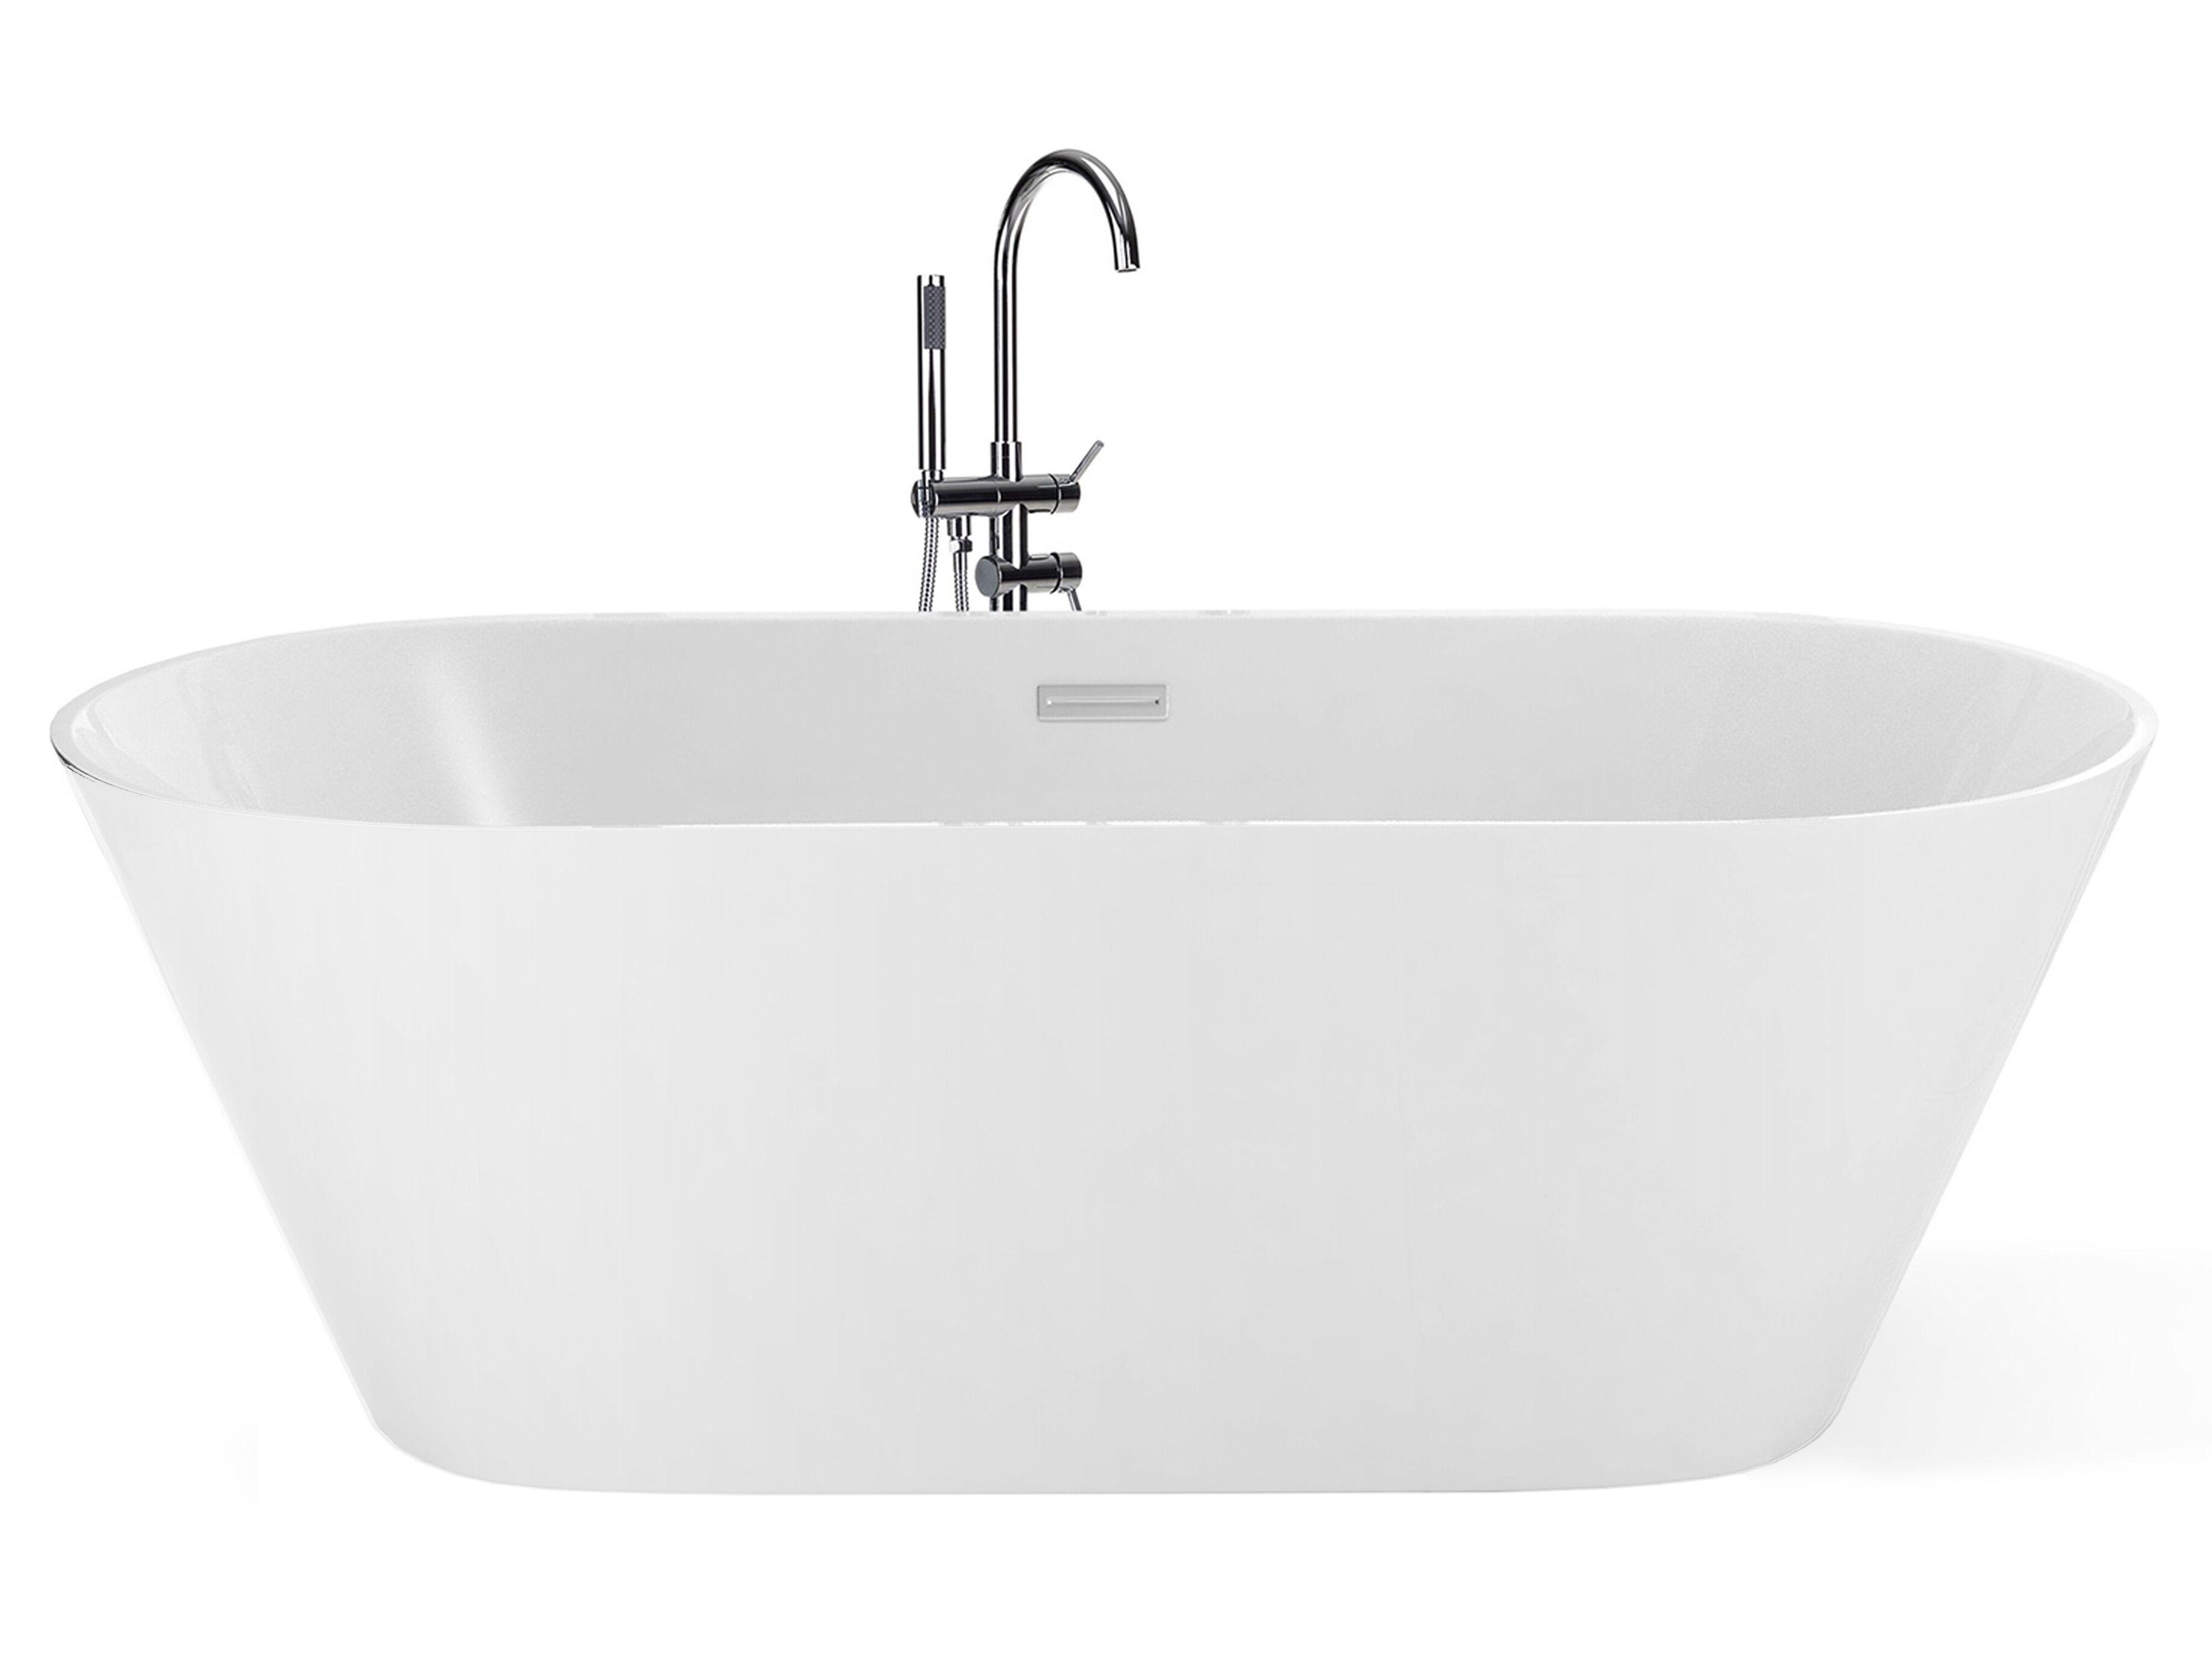 baignoire ilot ovale 160 cm en acrylique blanc bora bora